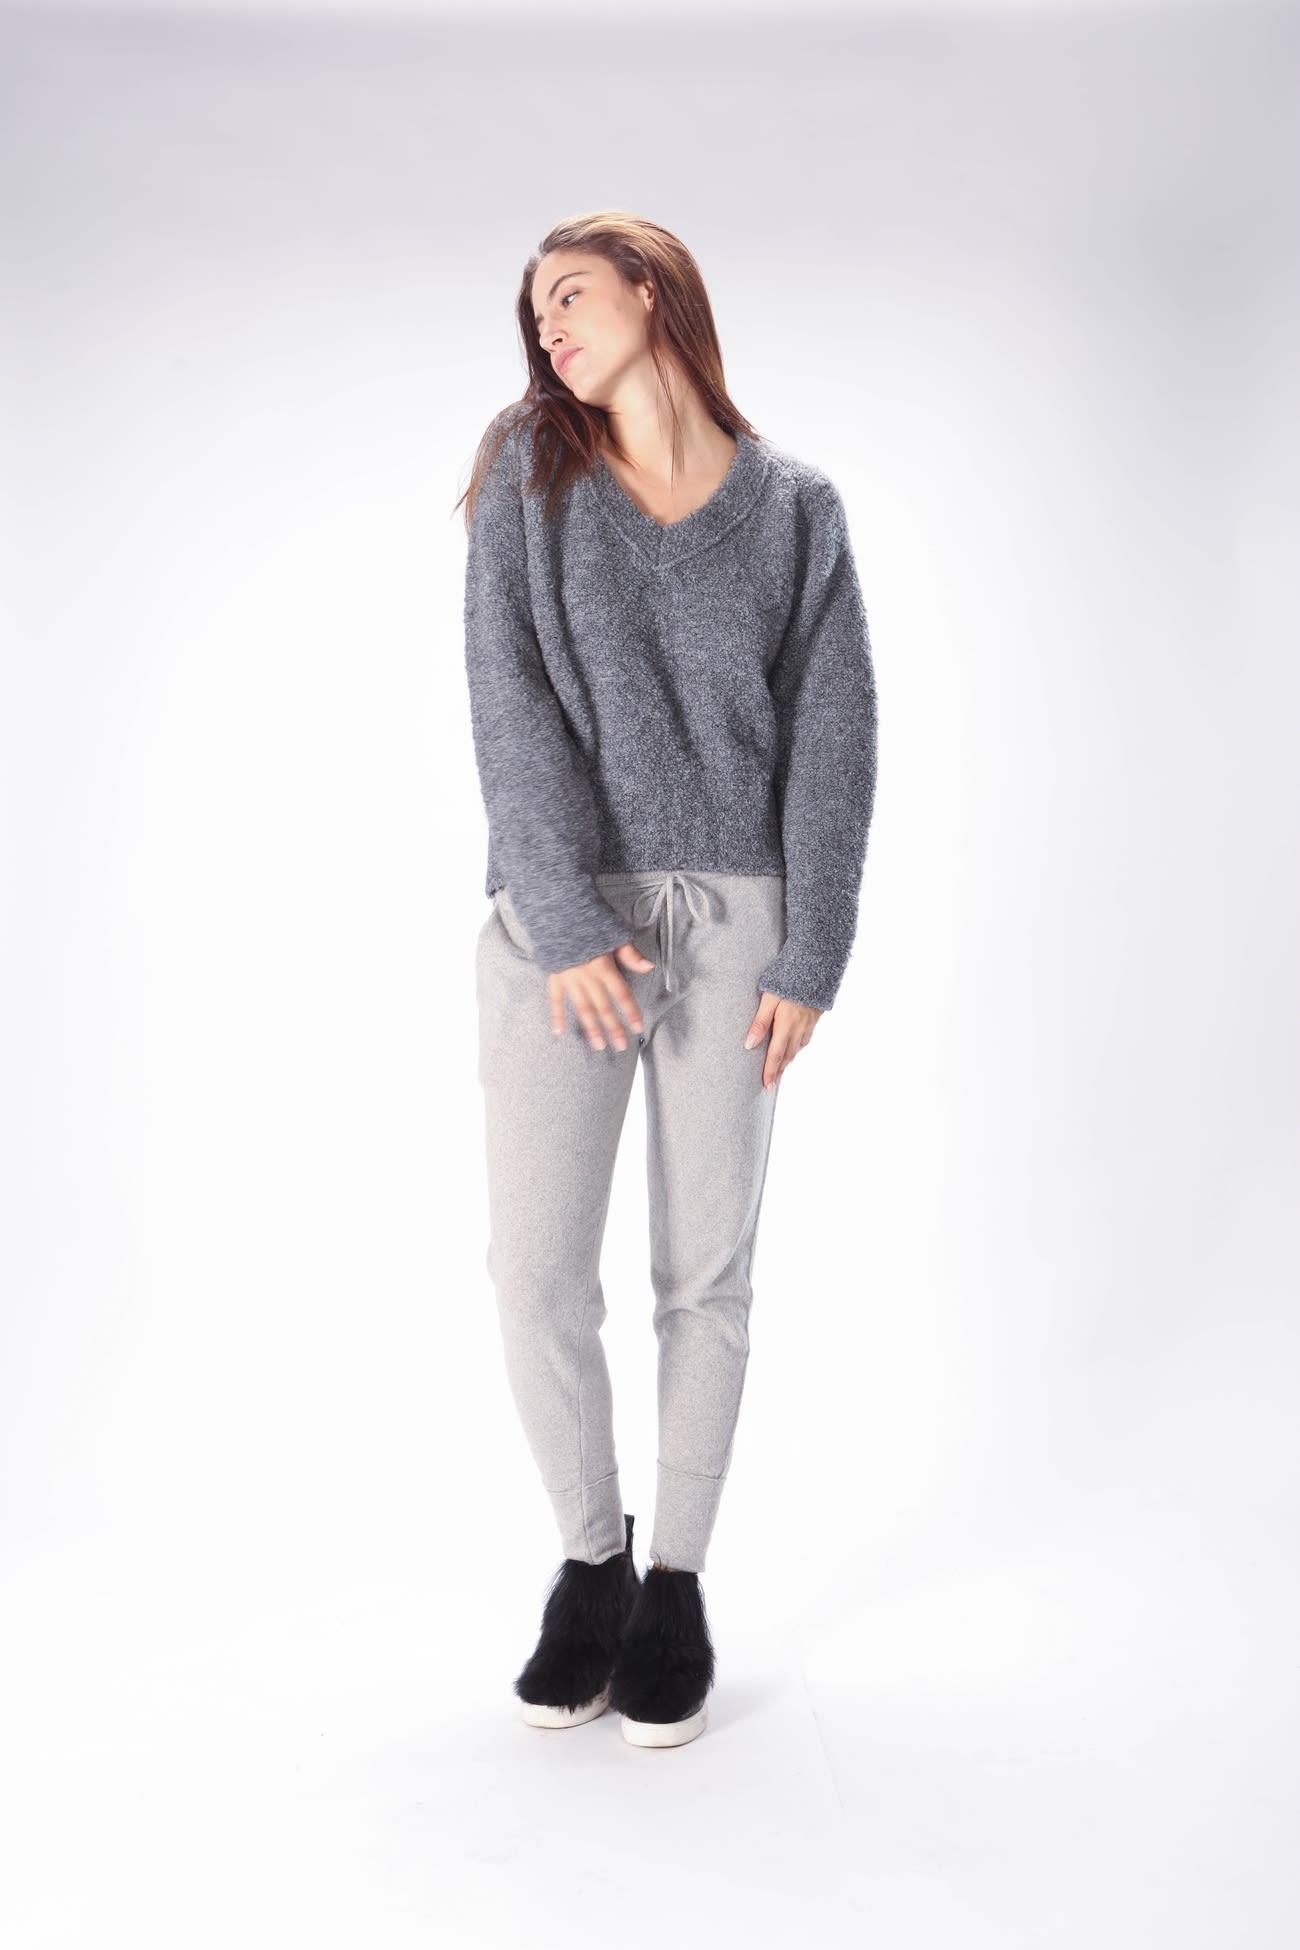 ALTALANA Sweater in 1002